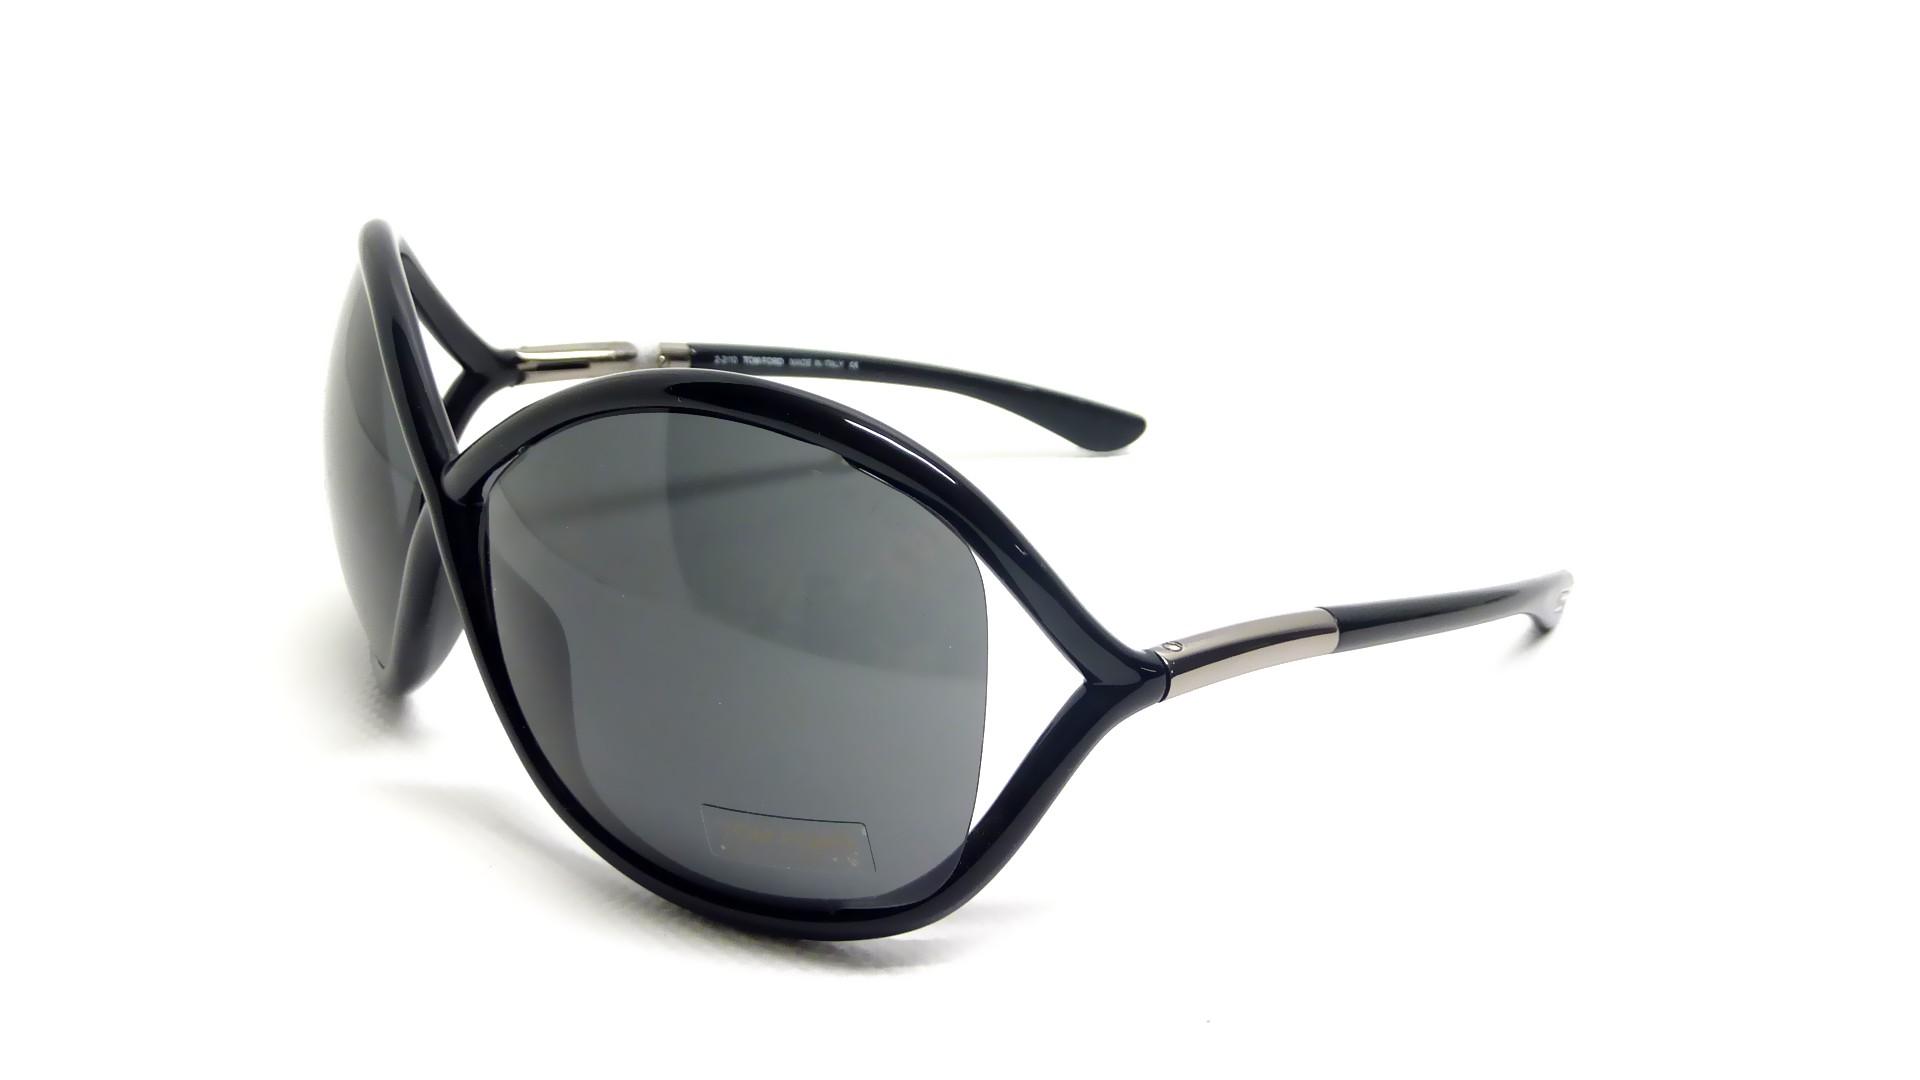 Sunglasses-Tom-Ford-Whitney-199-TF-9-Black-Bright-Metal-Charcoal-Gray-2211.jpg